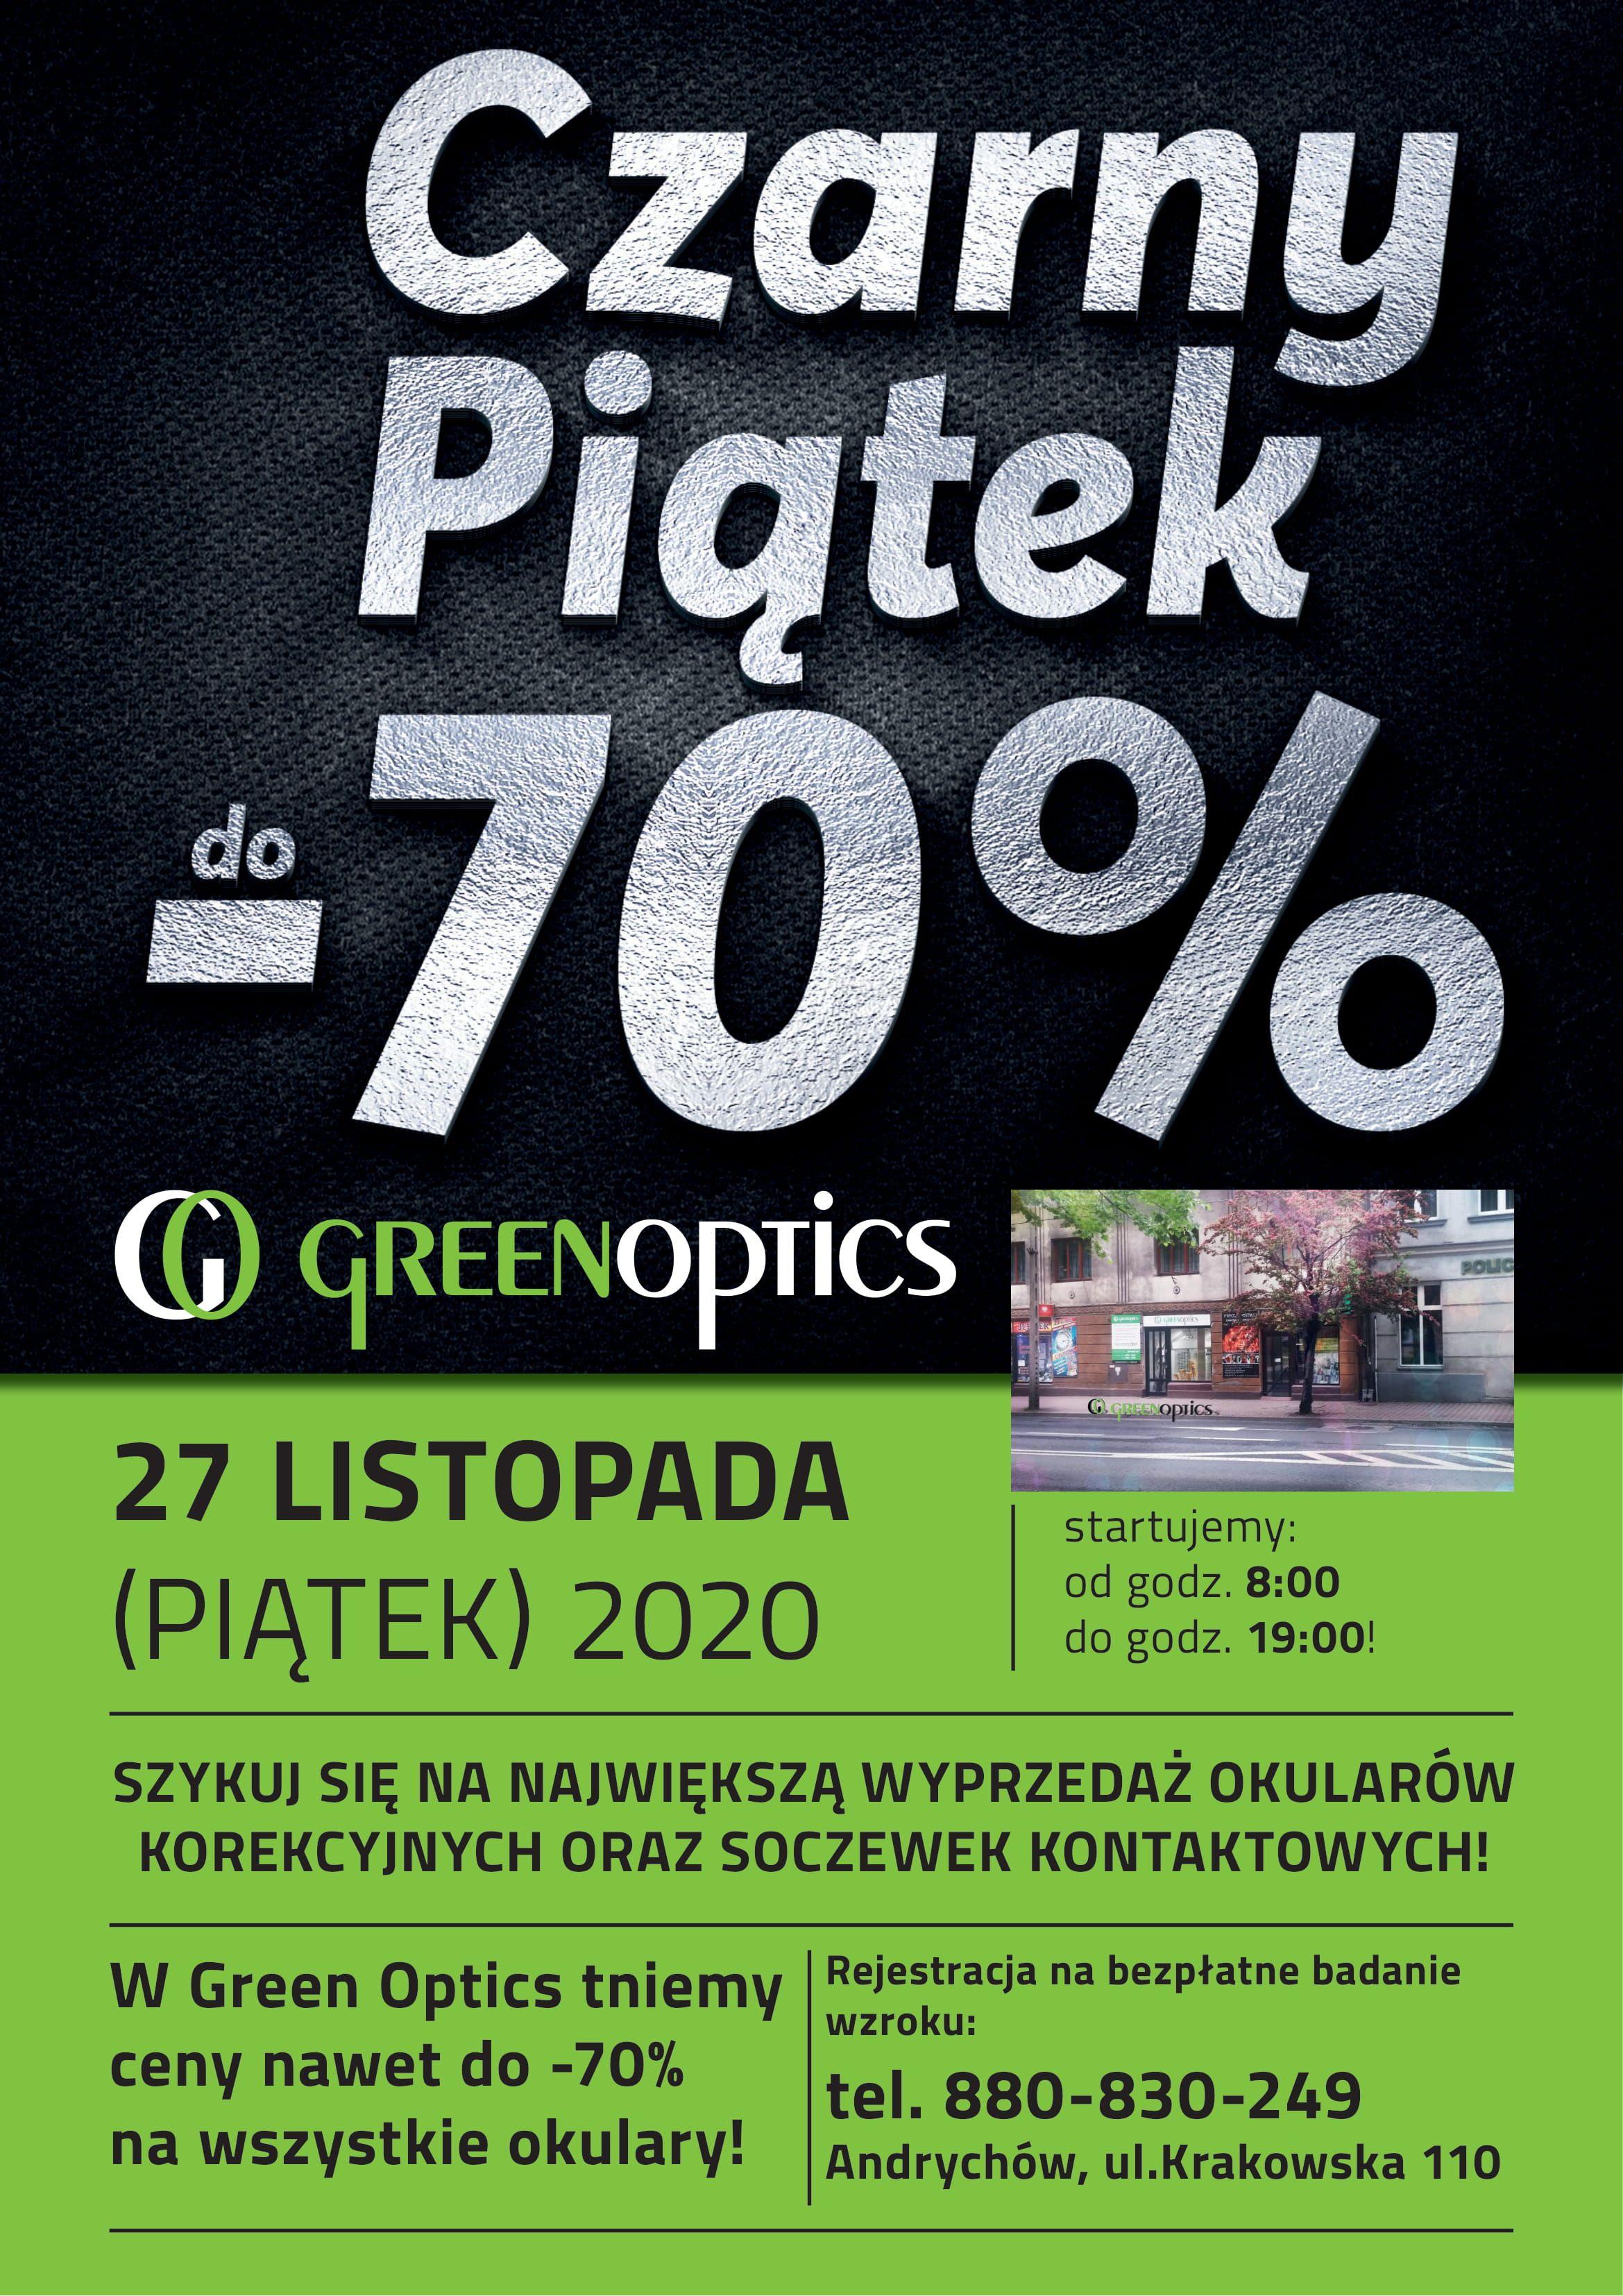 CZARNY PIĄTEK 2020 W GREEN OPTICS